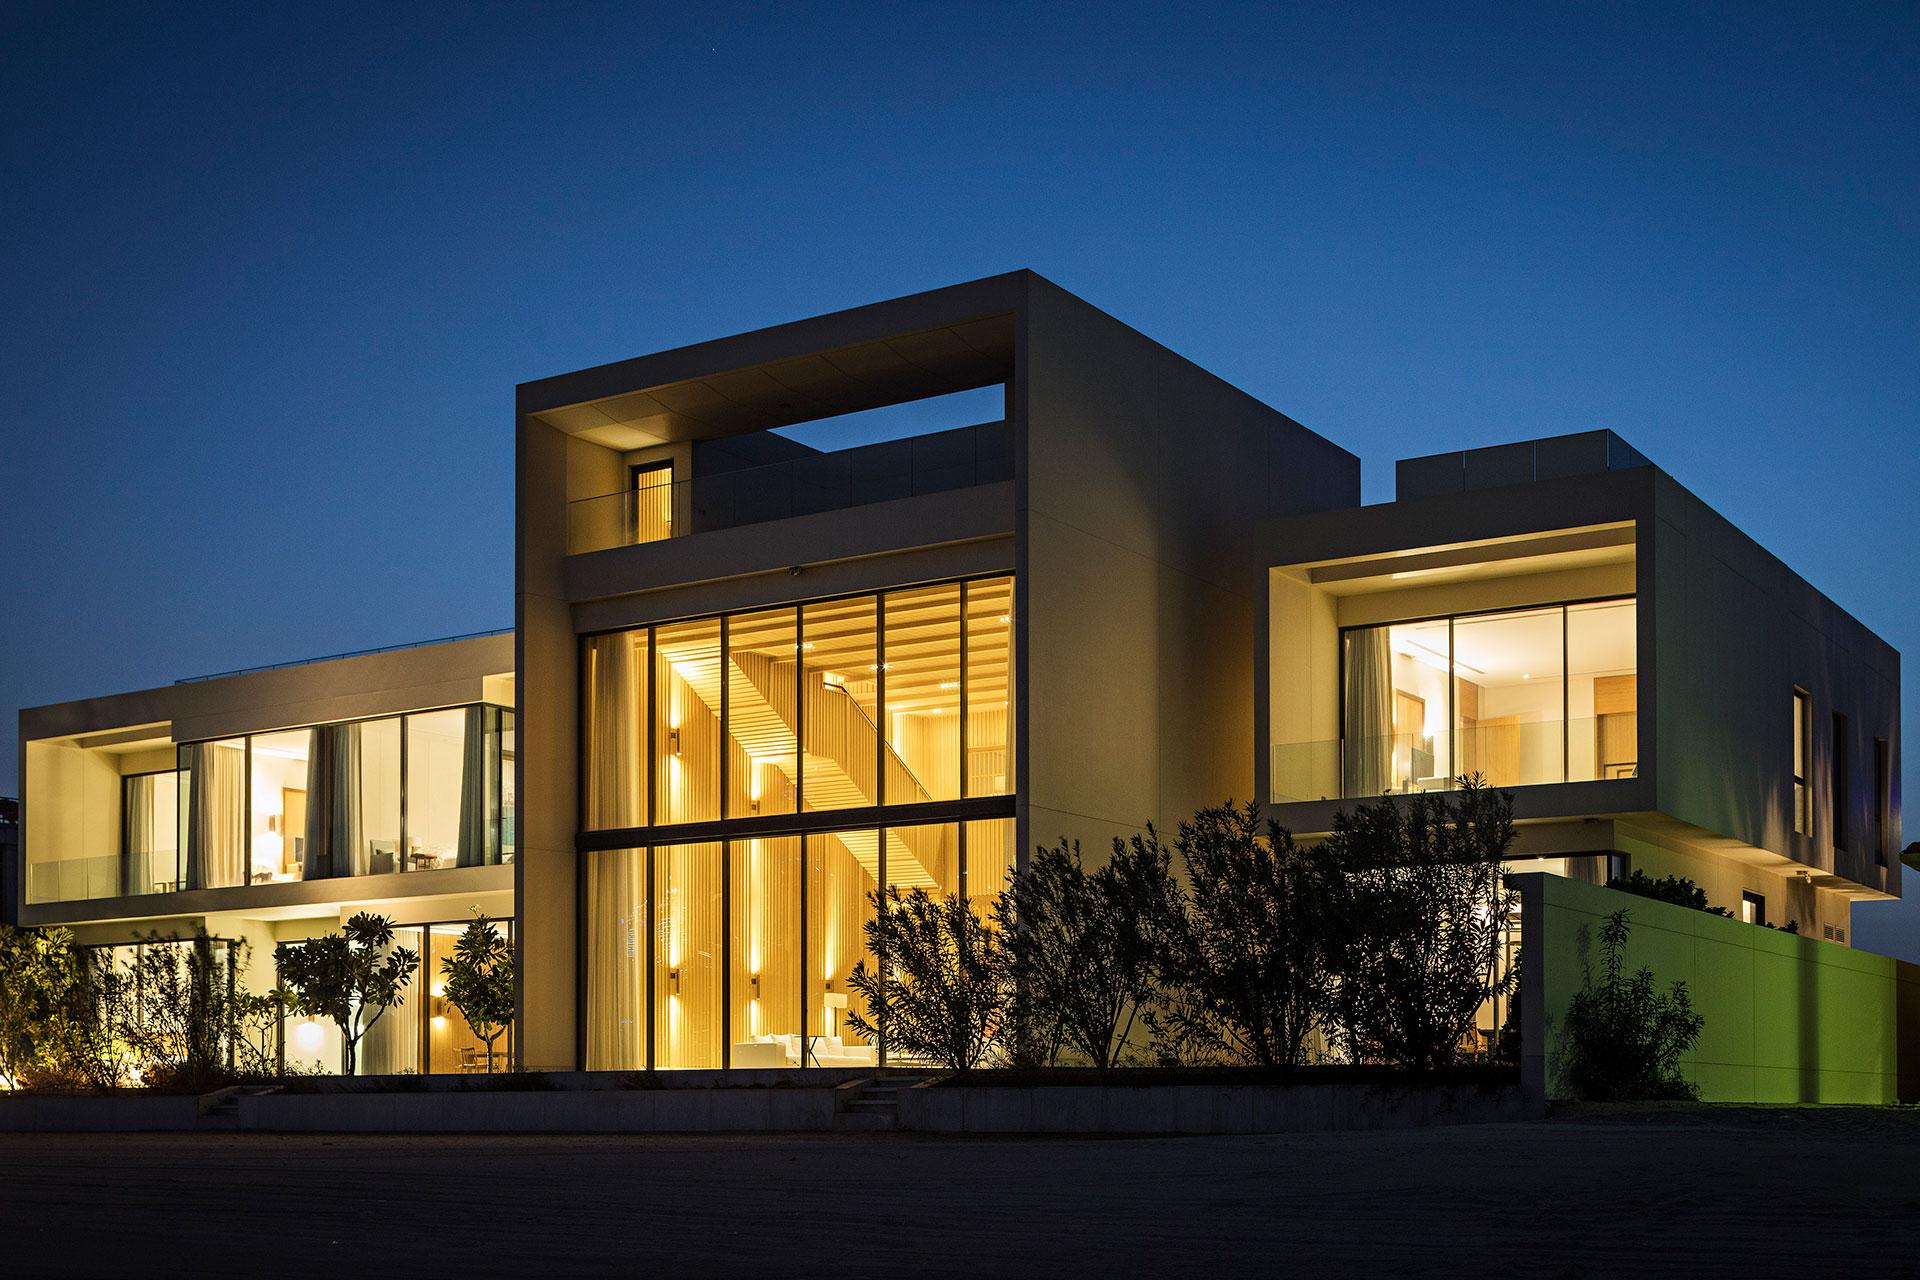 DUB5-AMAR-SABEH-Architecture-Studio-Palm-villa-Dubai-2018-©Yann-Deret-8720.jpg